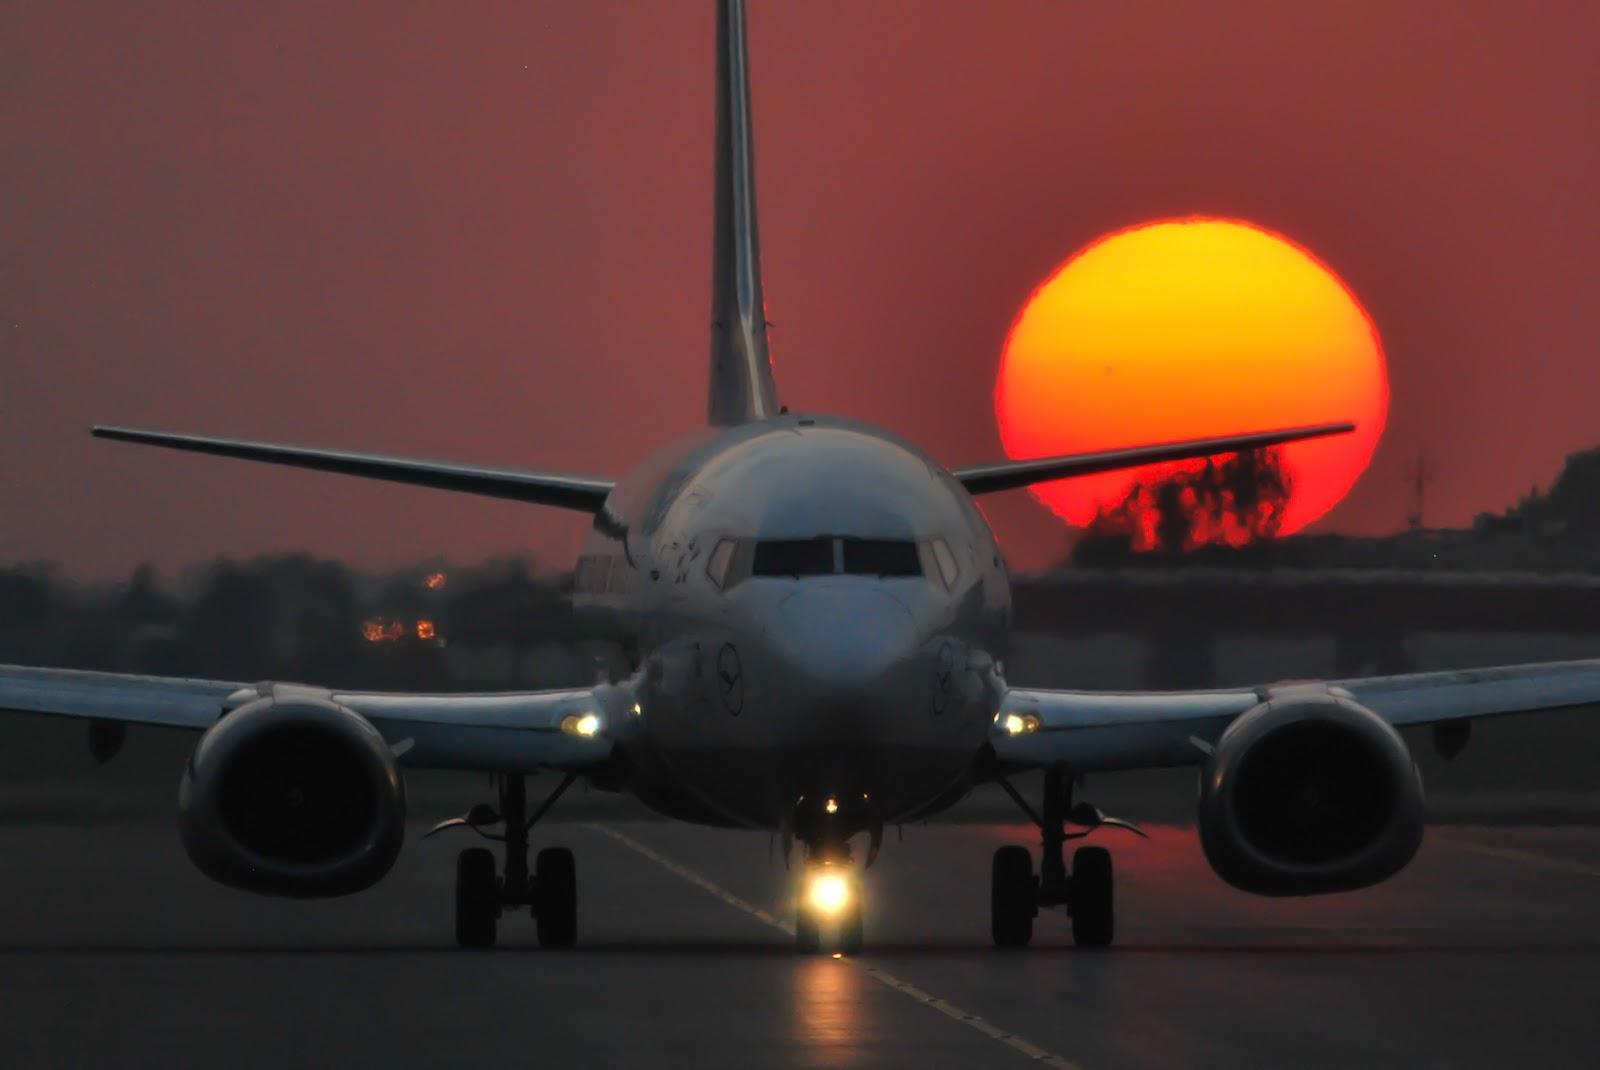 http://1.bp.blogspot.com/-07CKcs7KgsU/T_LcjI0DYiI/AAAAAAAAKZ4/ql8GLiQytFM/s1600/boeing_737-500_sunset_taxiing.jpg